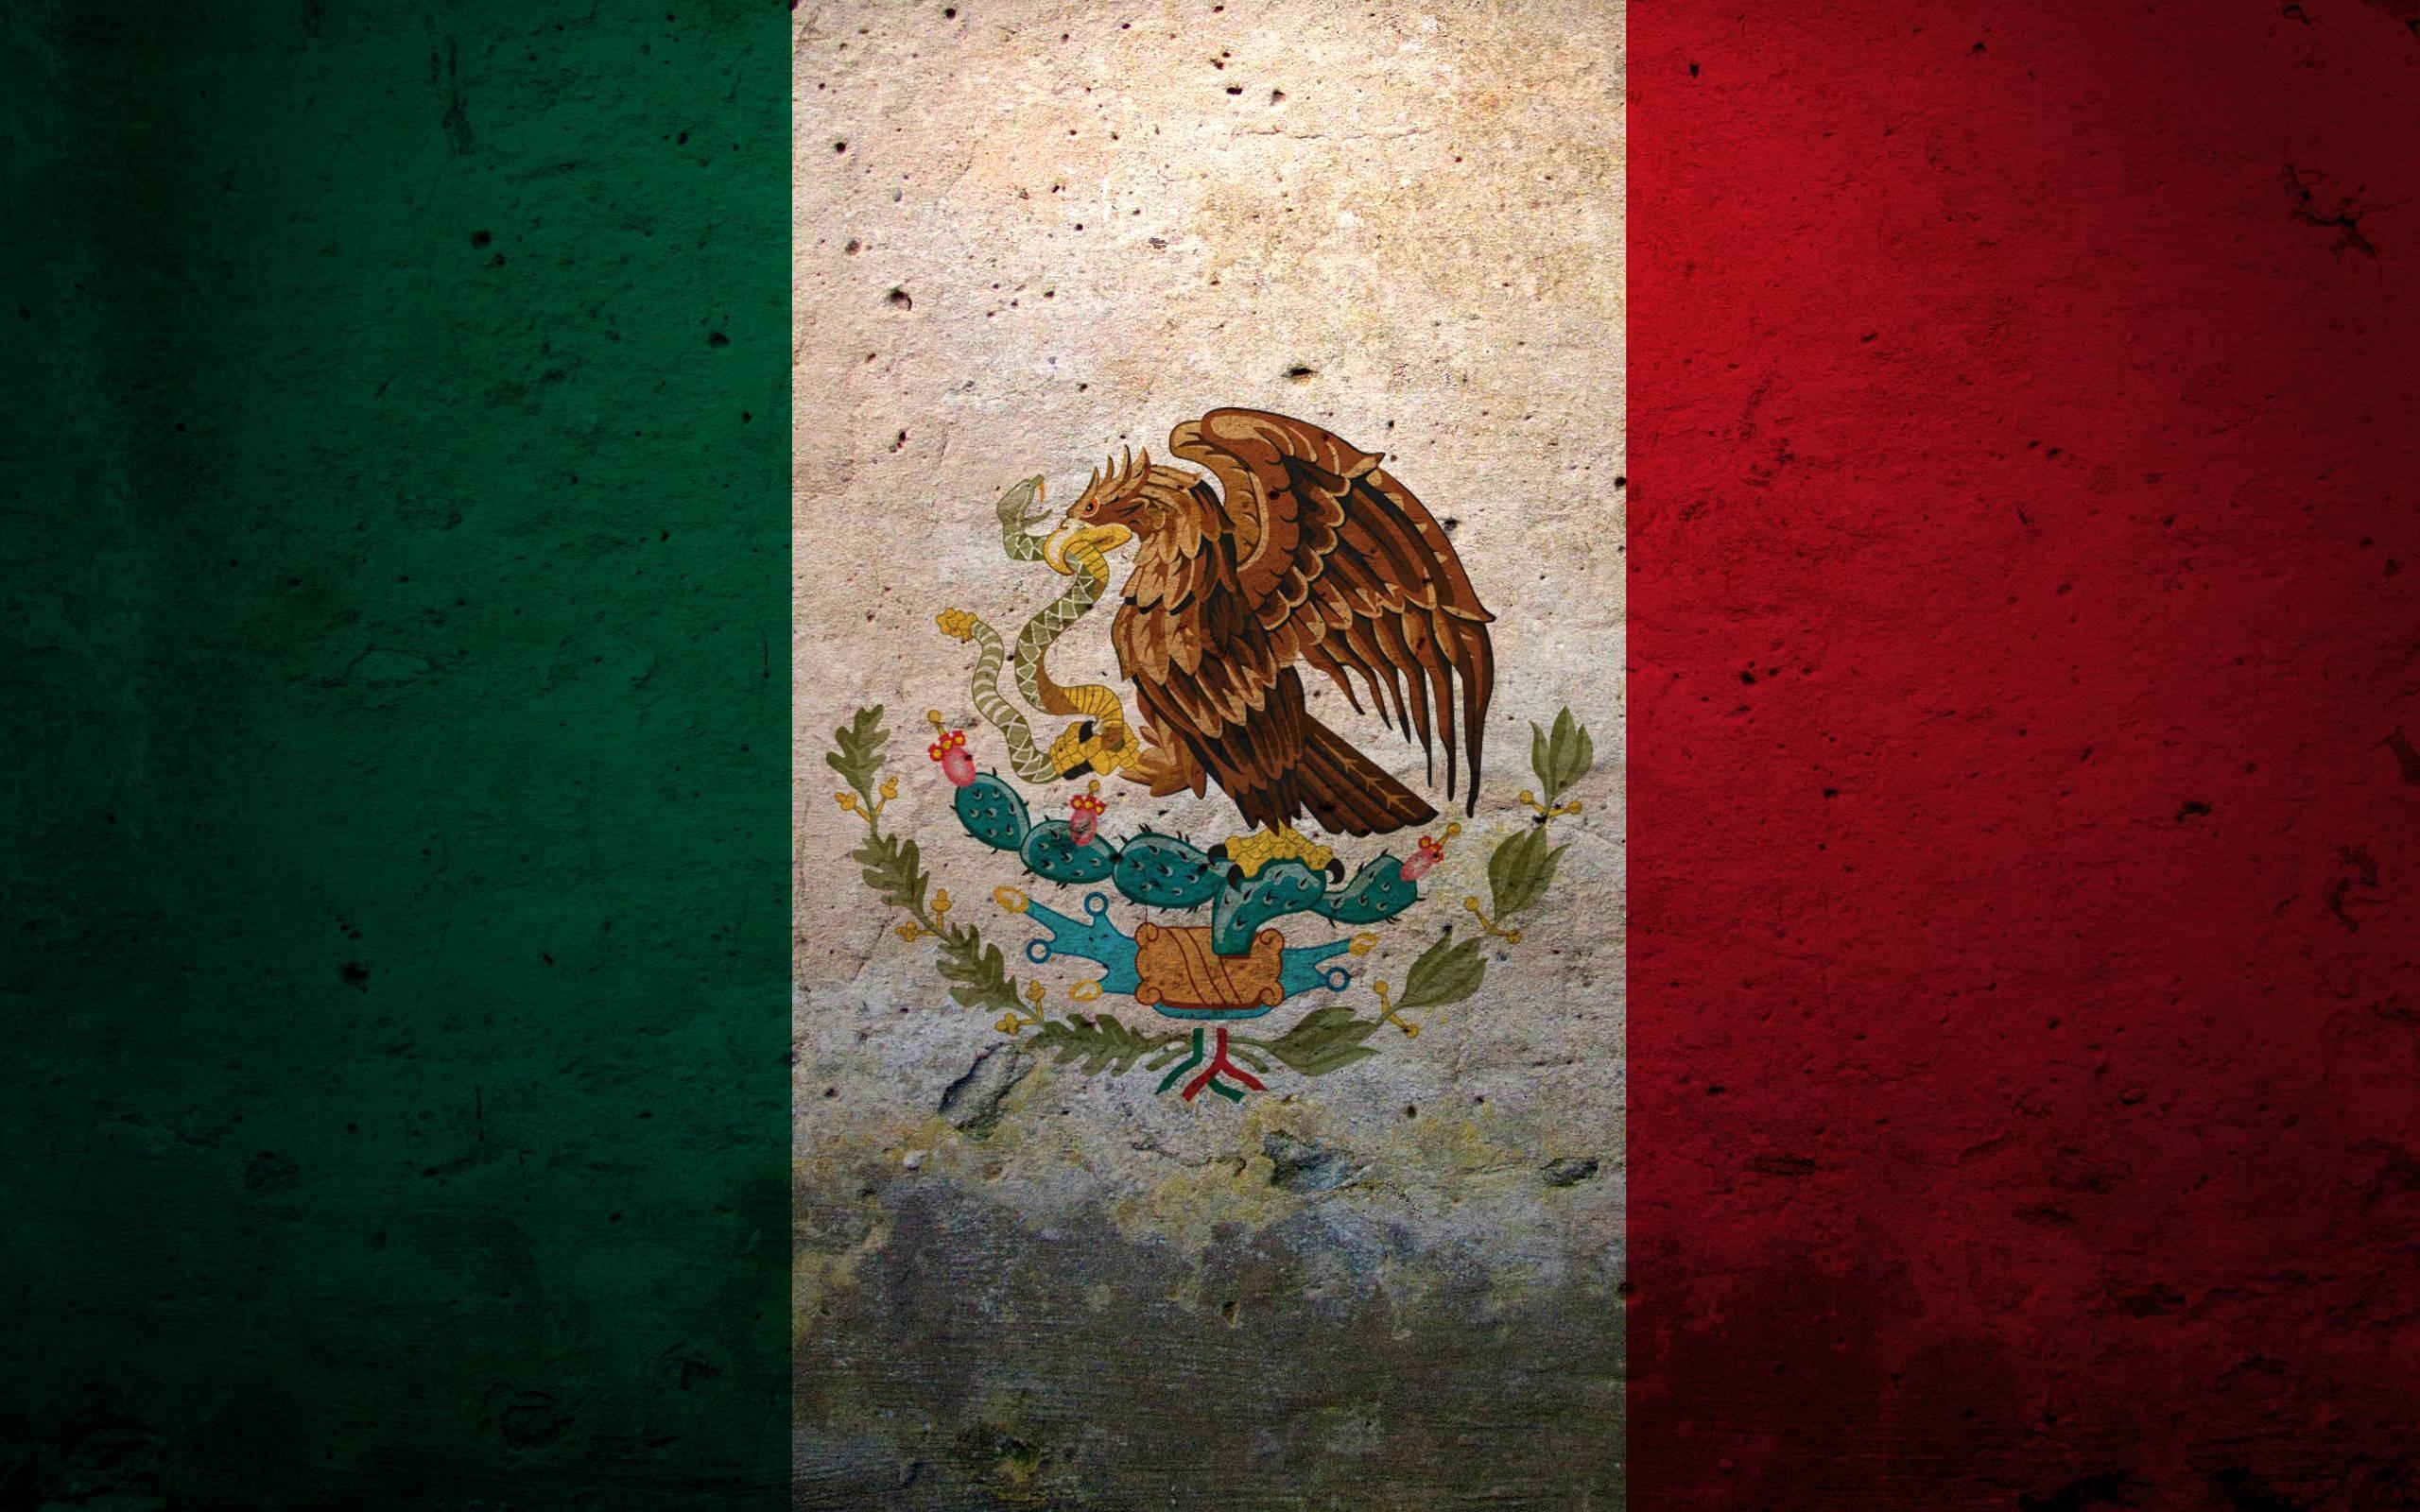 Mexican Flag Wallpaper iPhone 6 – WallpaperSafari